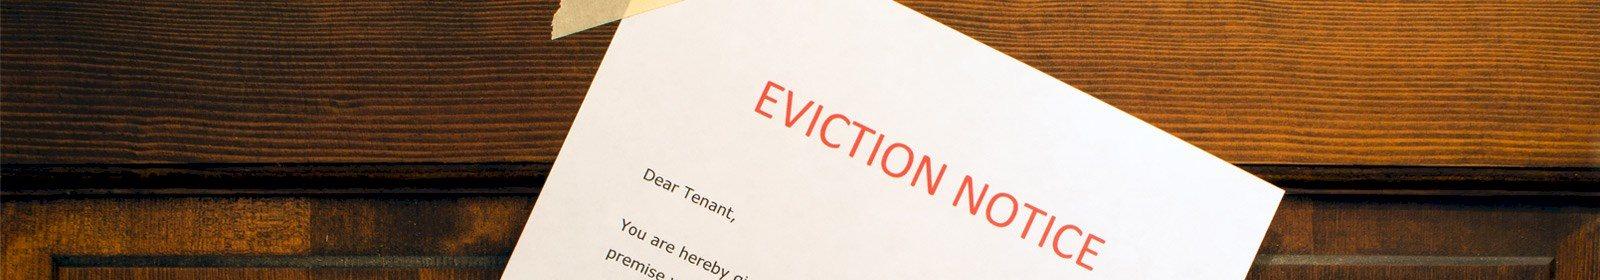 Unlawful evictions